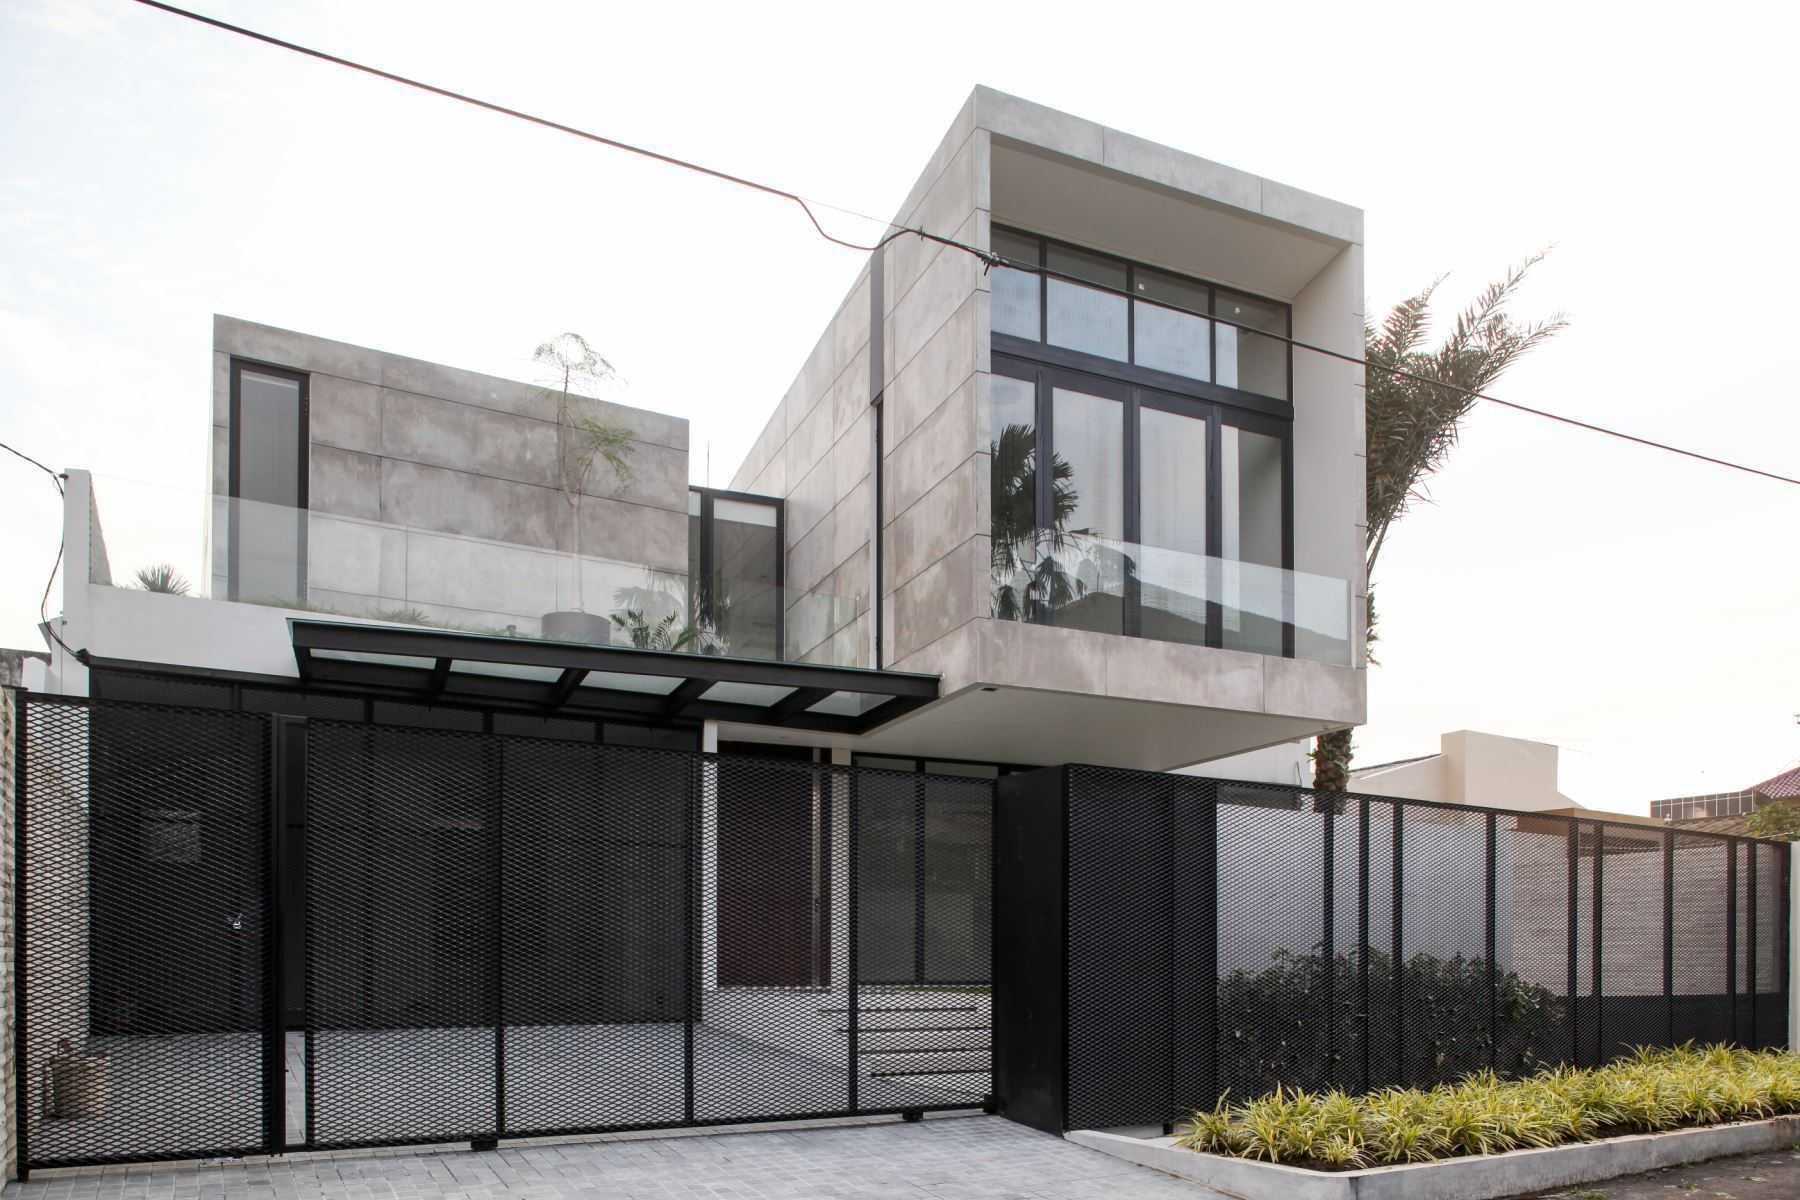 Ivan Priatman Architecture Rl House Surabaya, Kota Sby, Jawa Timur, Indonesia Surabaya, Kota Sby, Jawa Timur, Indonesia Ivan-Priatman-Architecture-Rl-House   59088